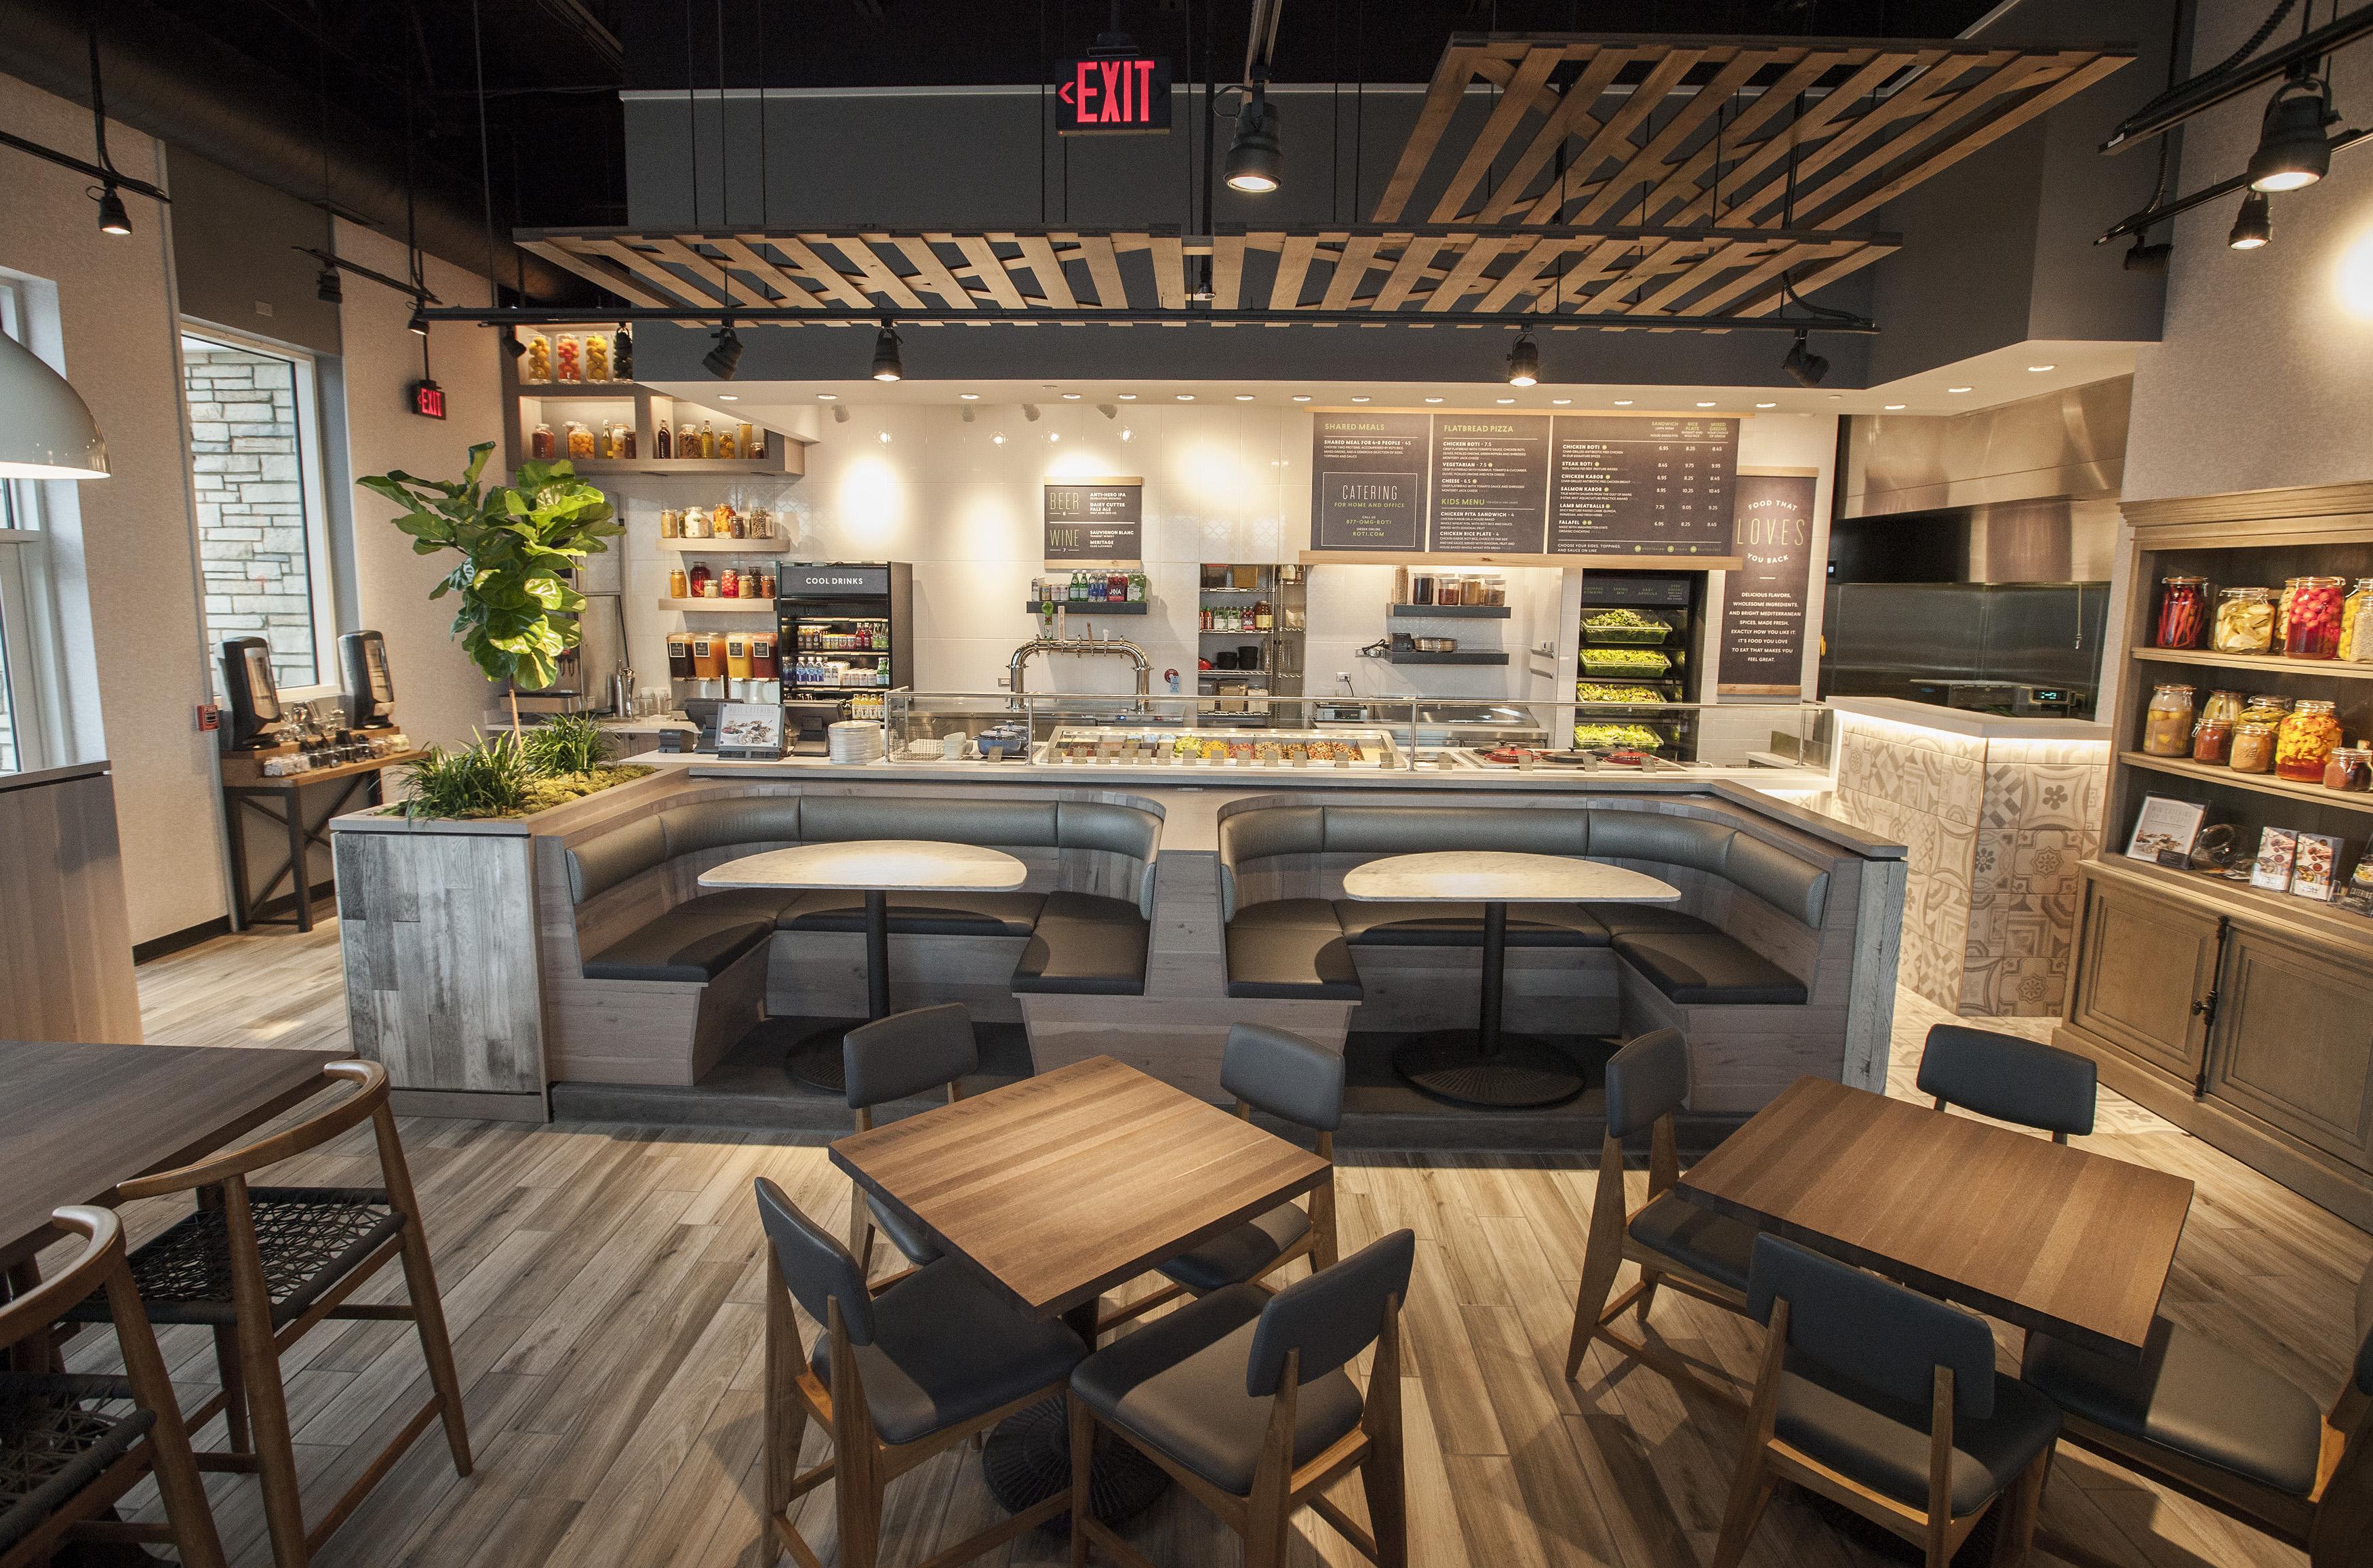 Roti modern mediterranean second location now open in